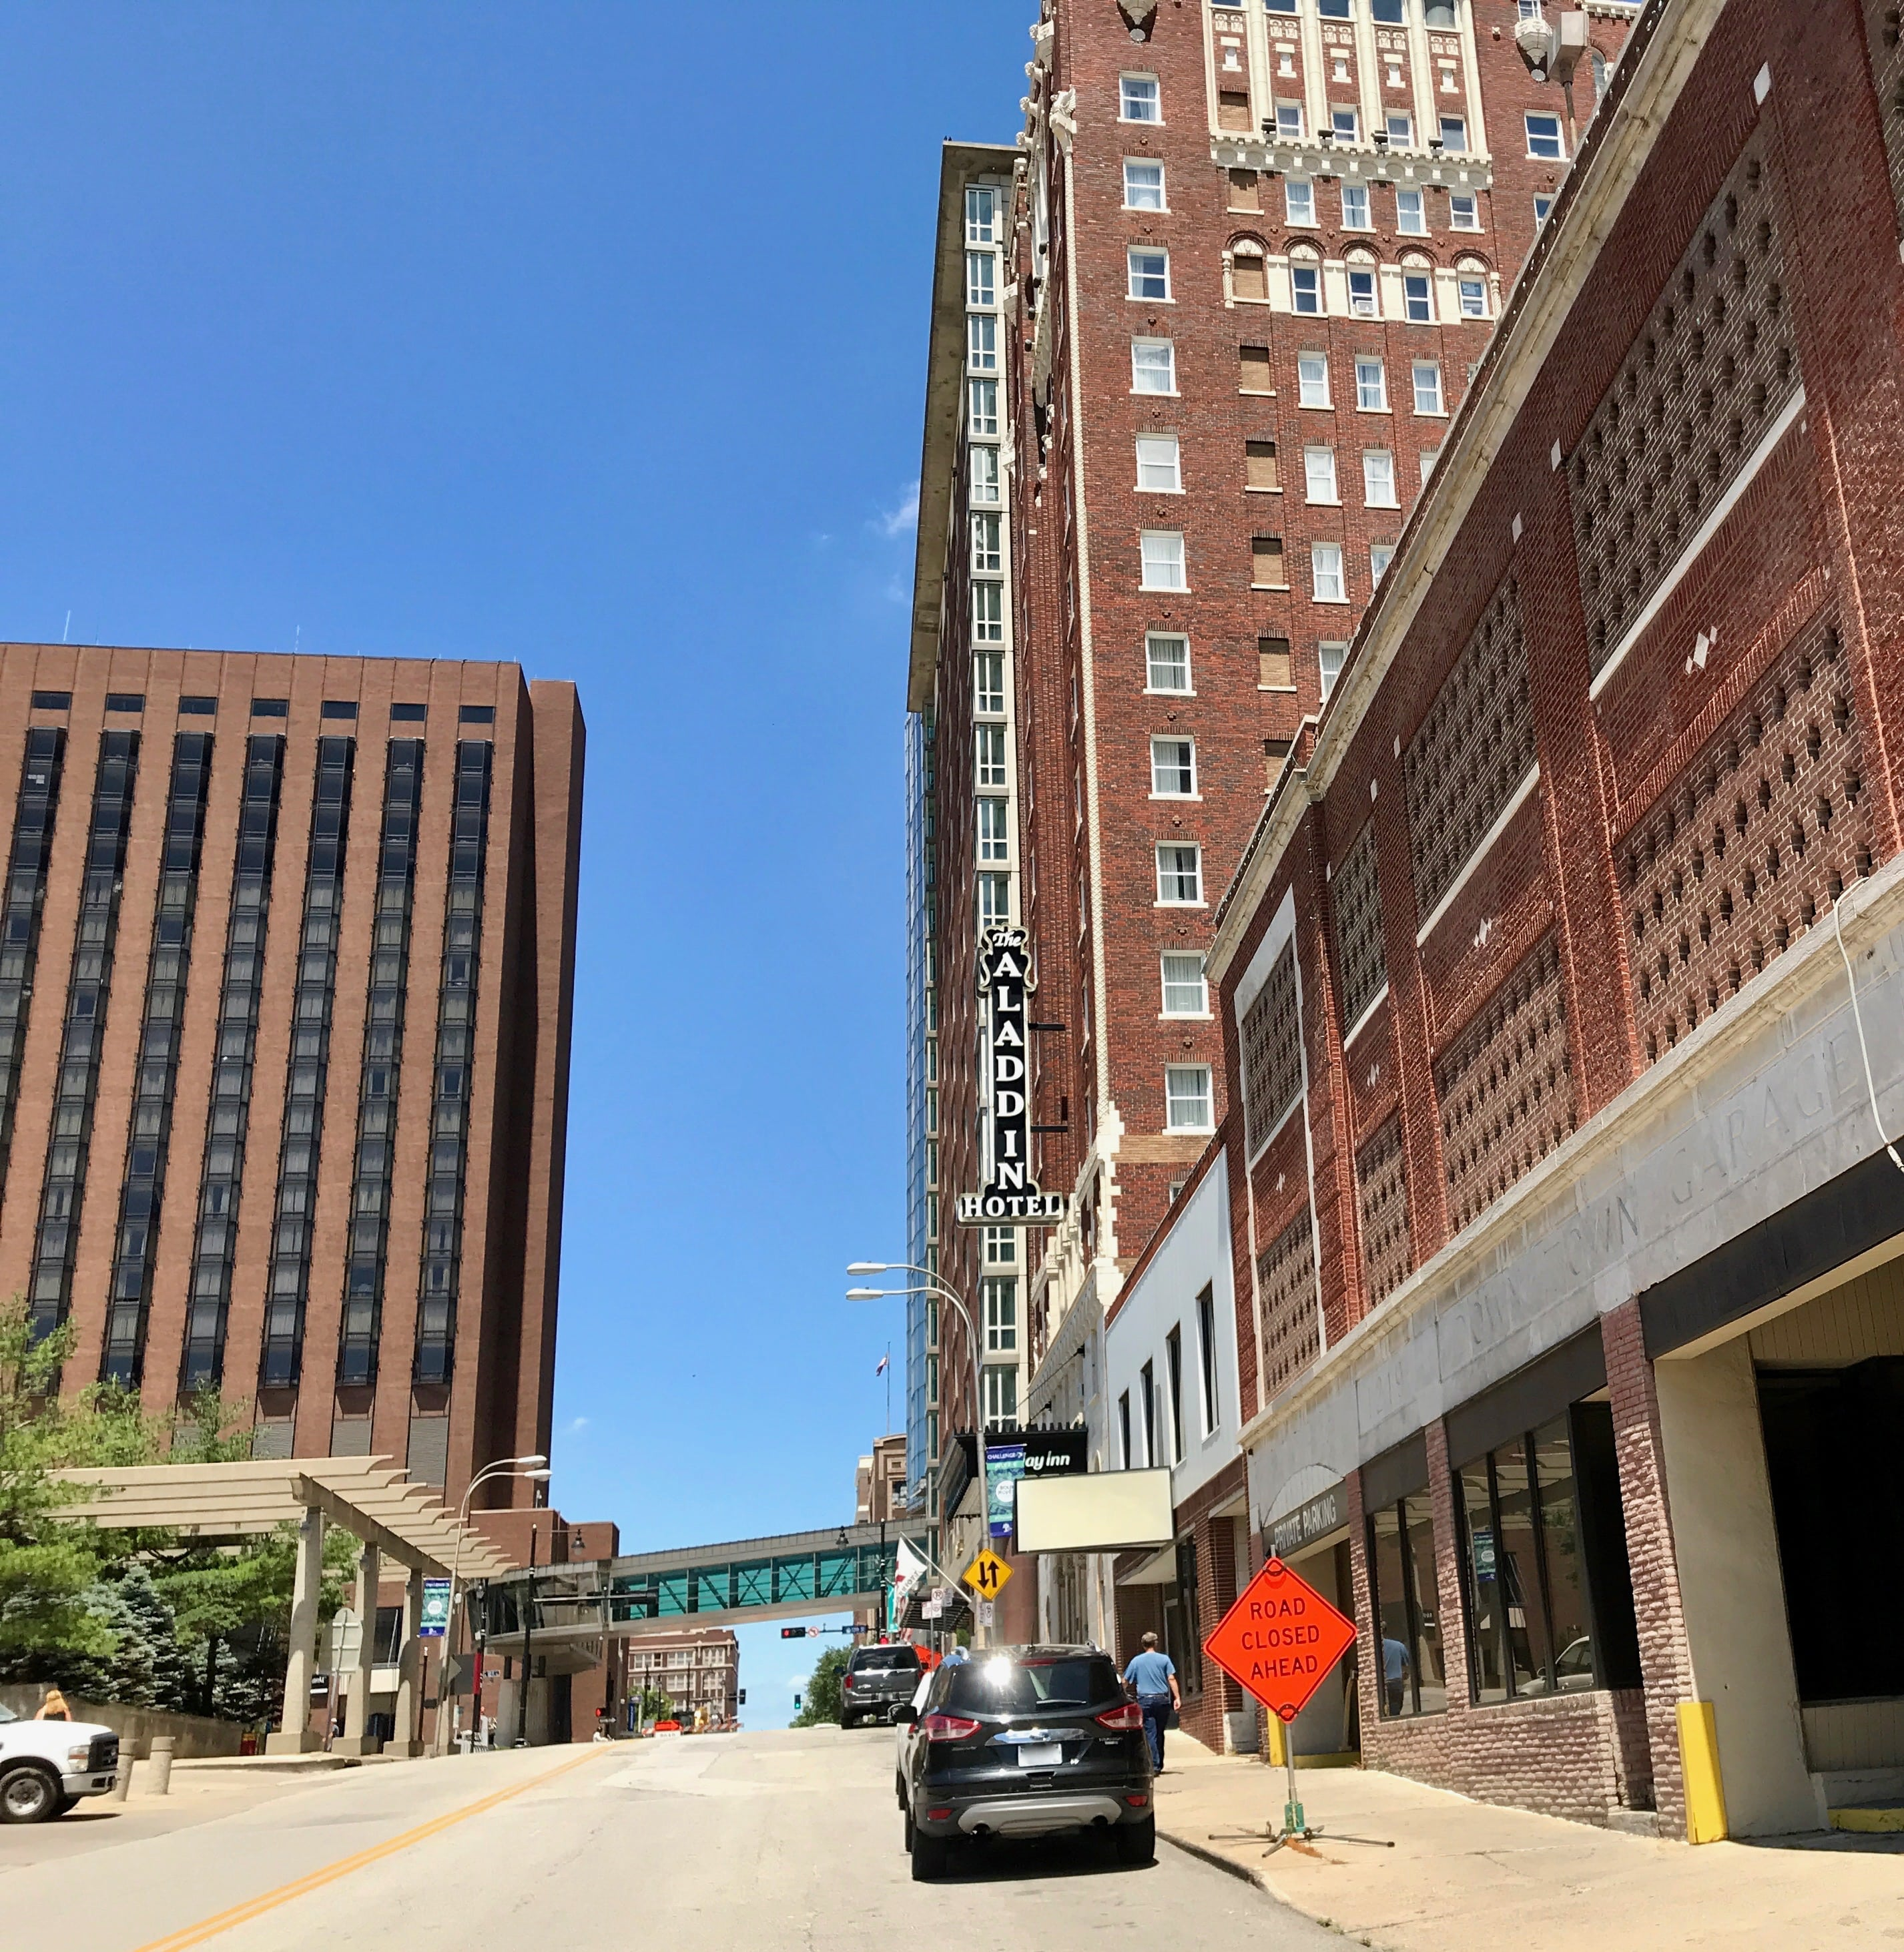 Downtown Street in KCMO